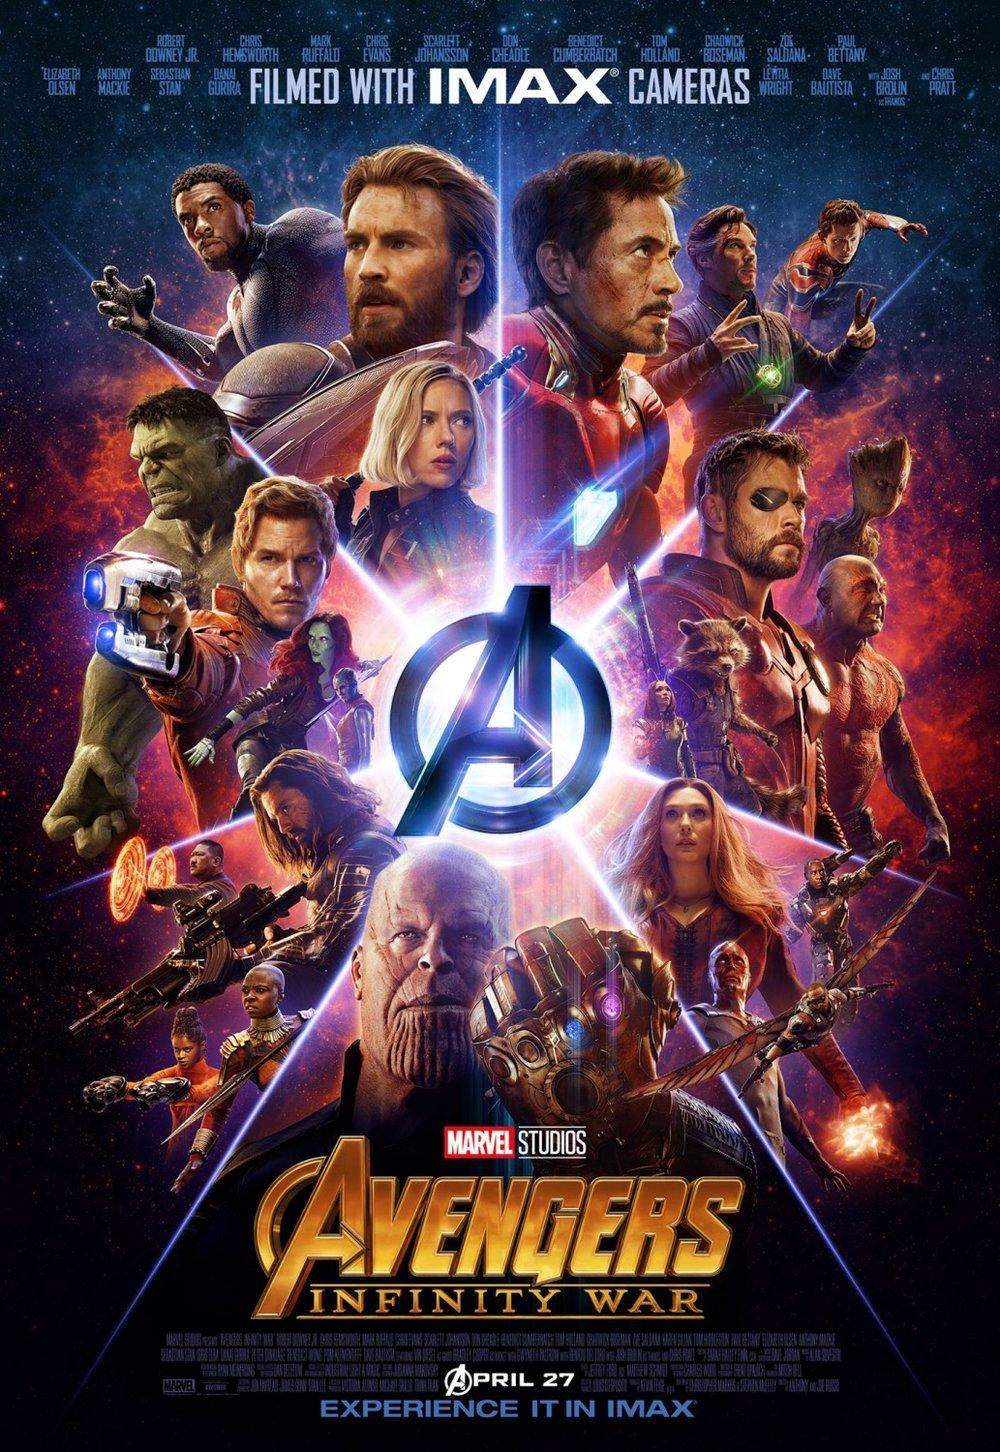 7. Avengers: Infinity War - dir. Joe & Anthony Russo